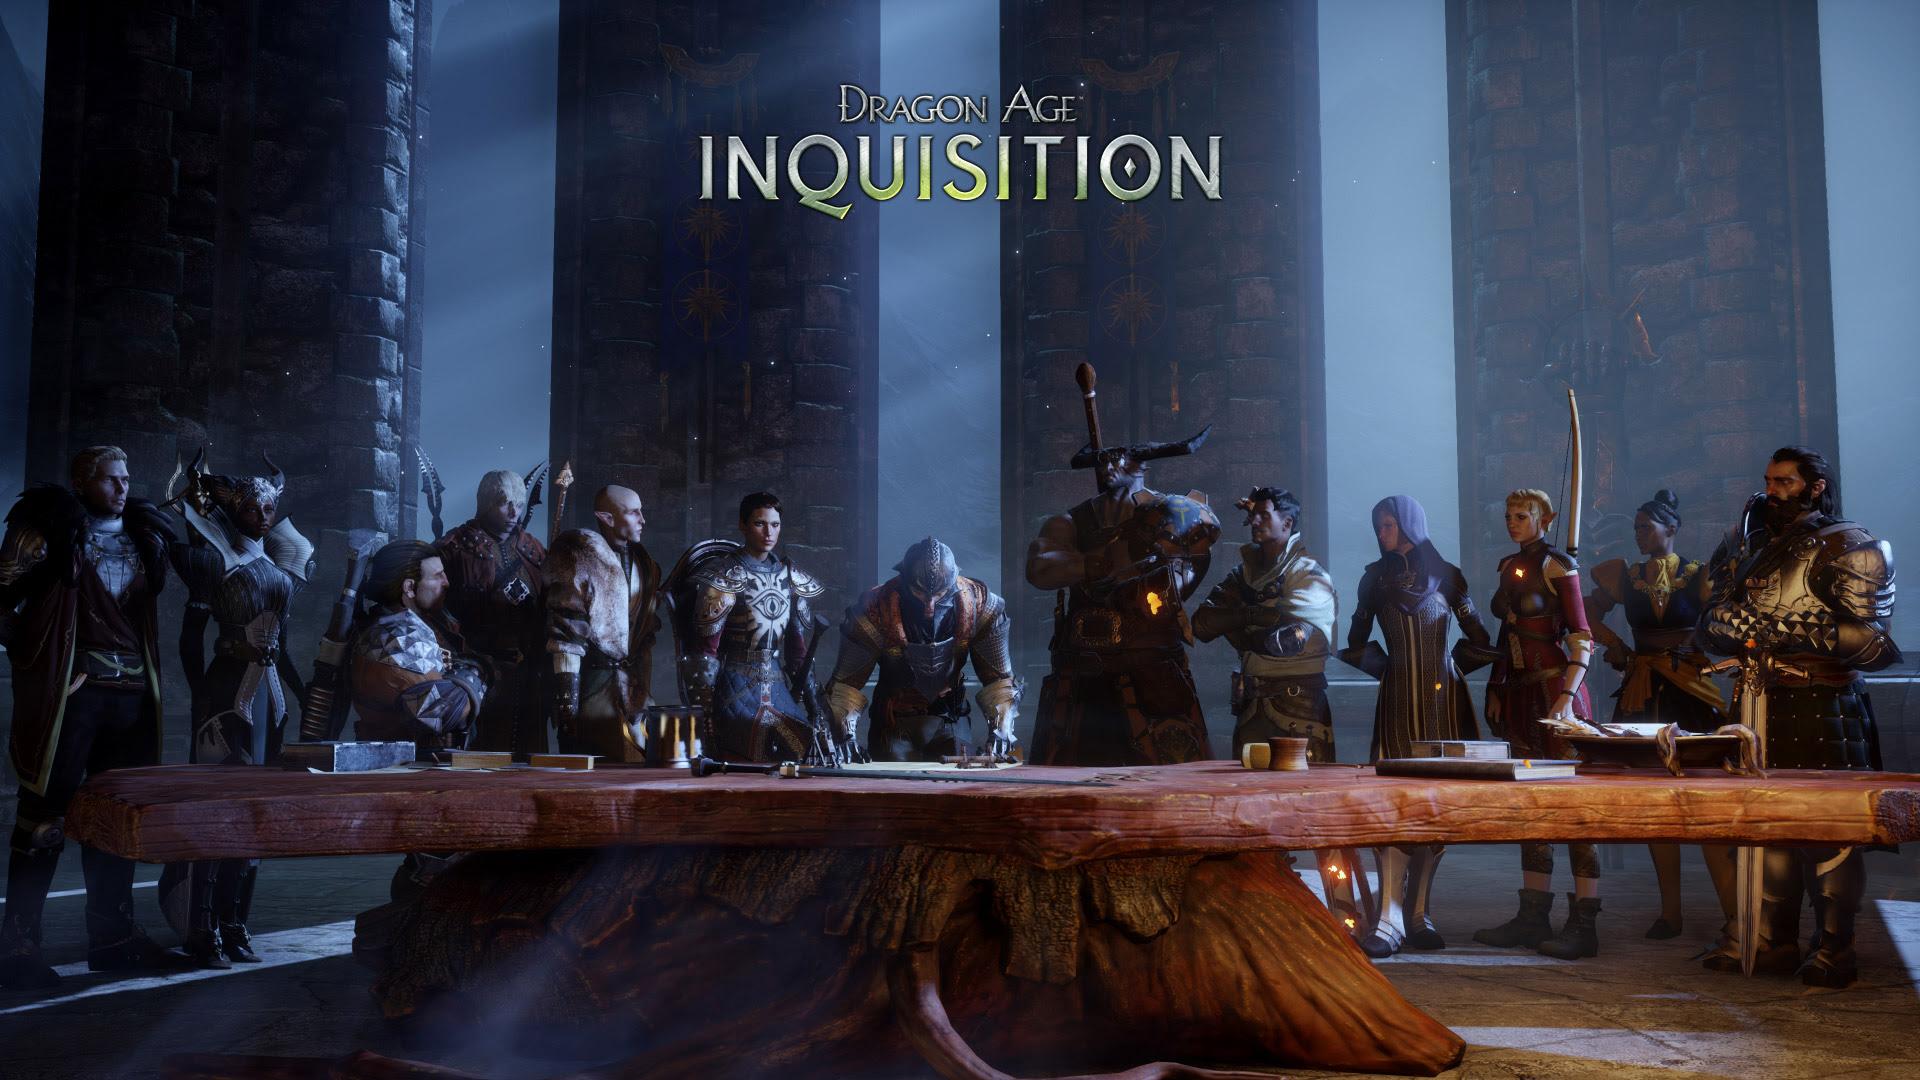 Dragon Age Inquisition Wallpaper 23